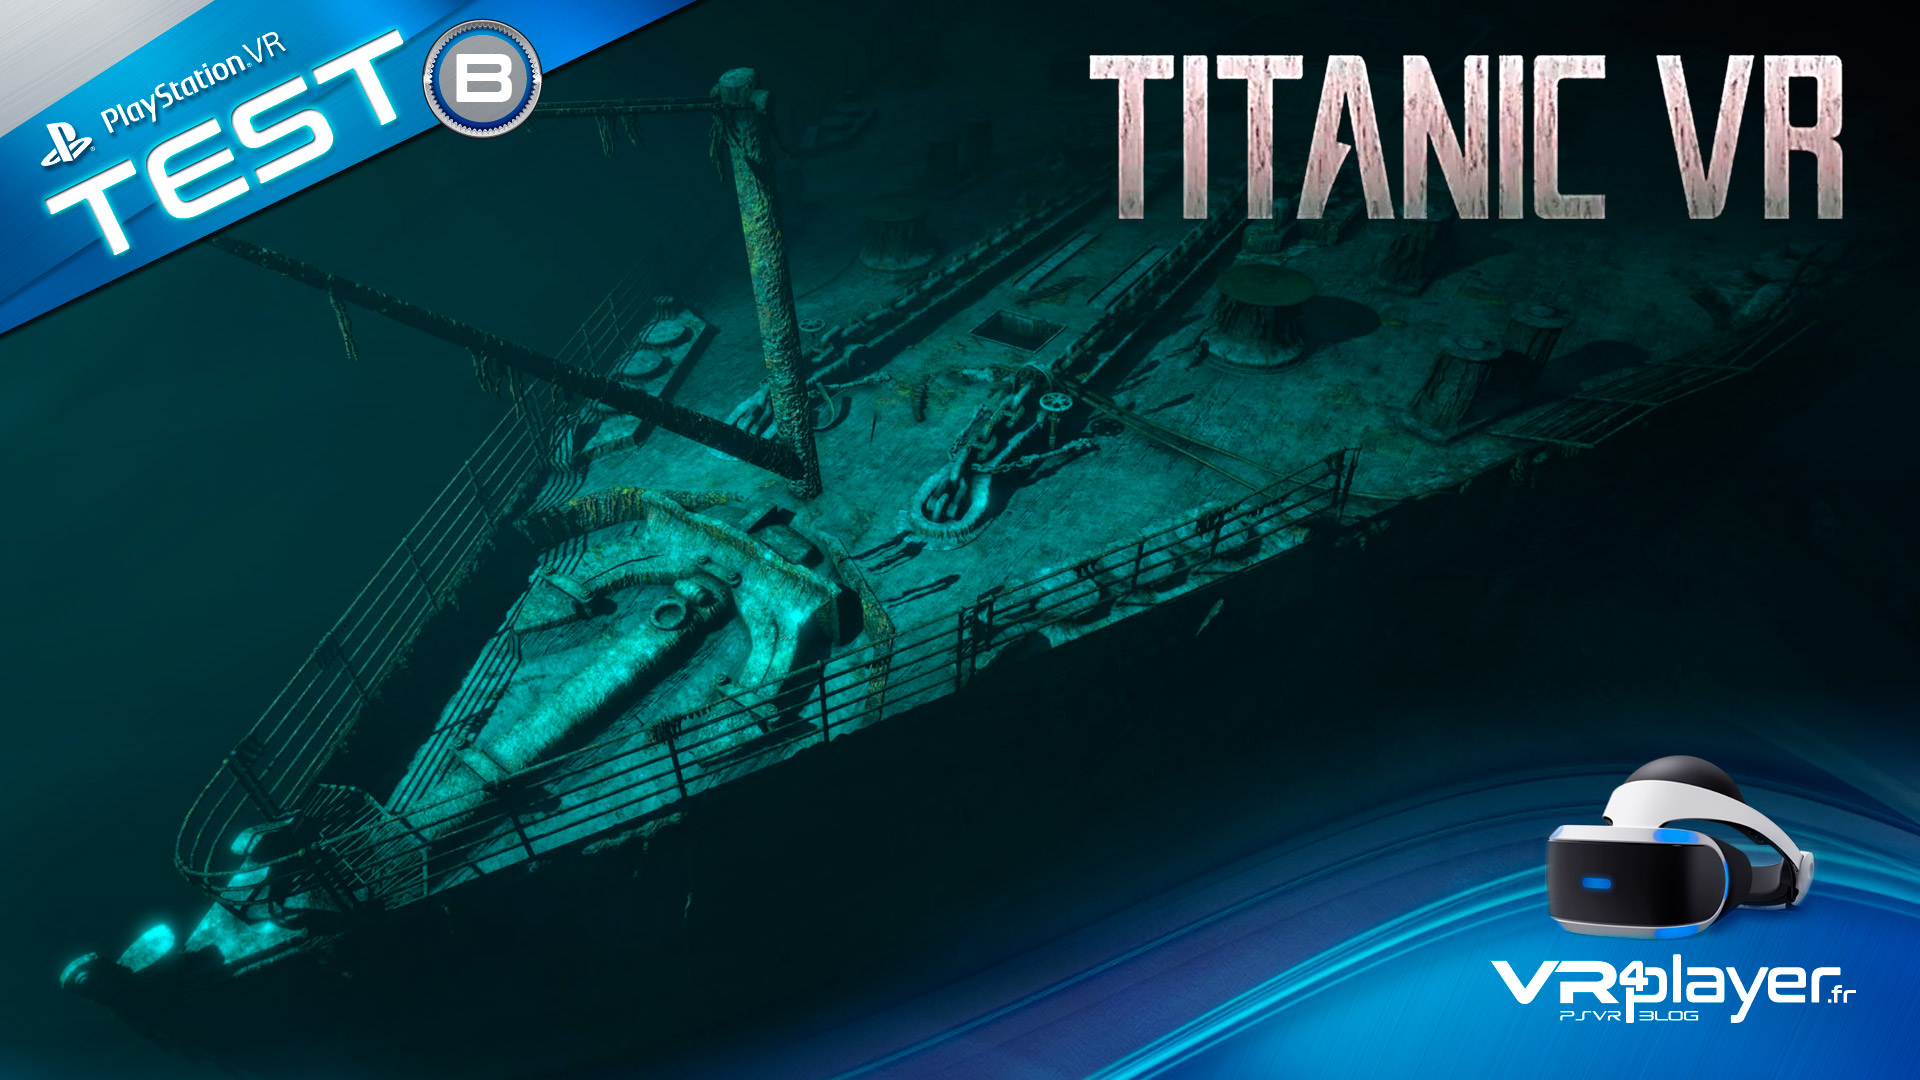 Titanic VR VR Immersive Education TEST Review VR4Player